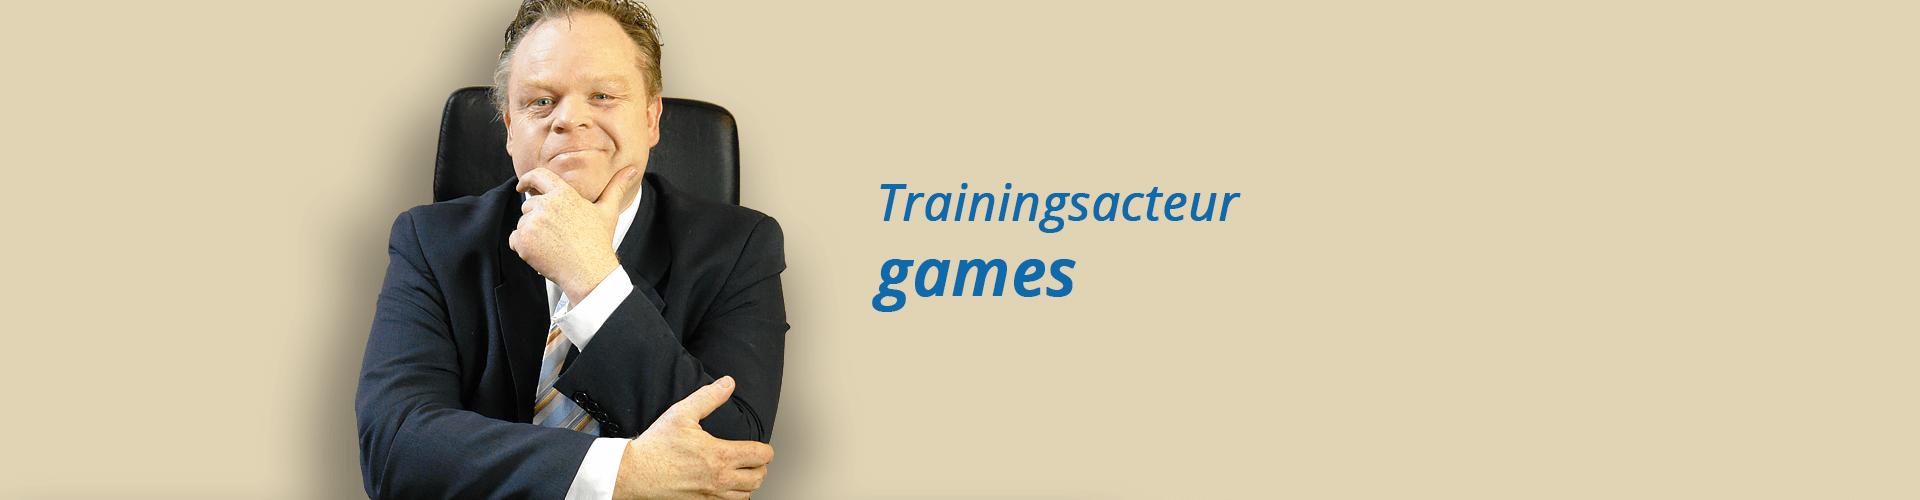 Trainingsacteur games